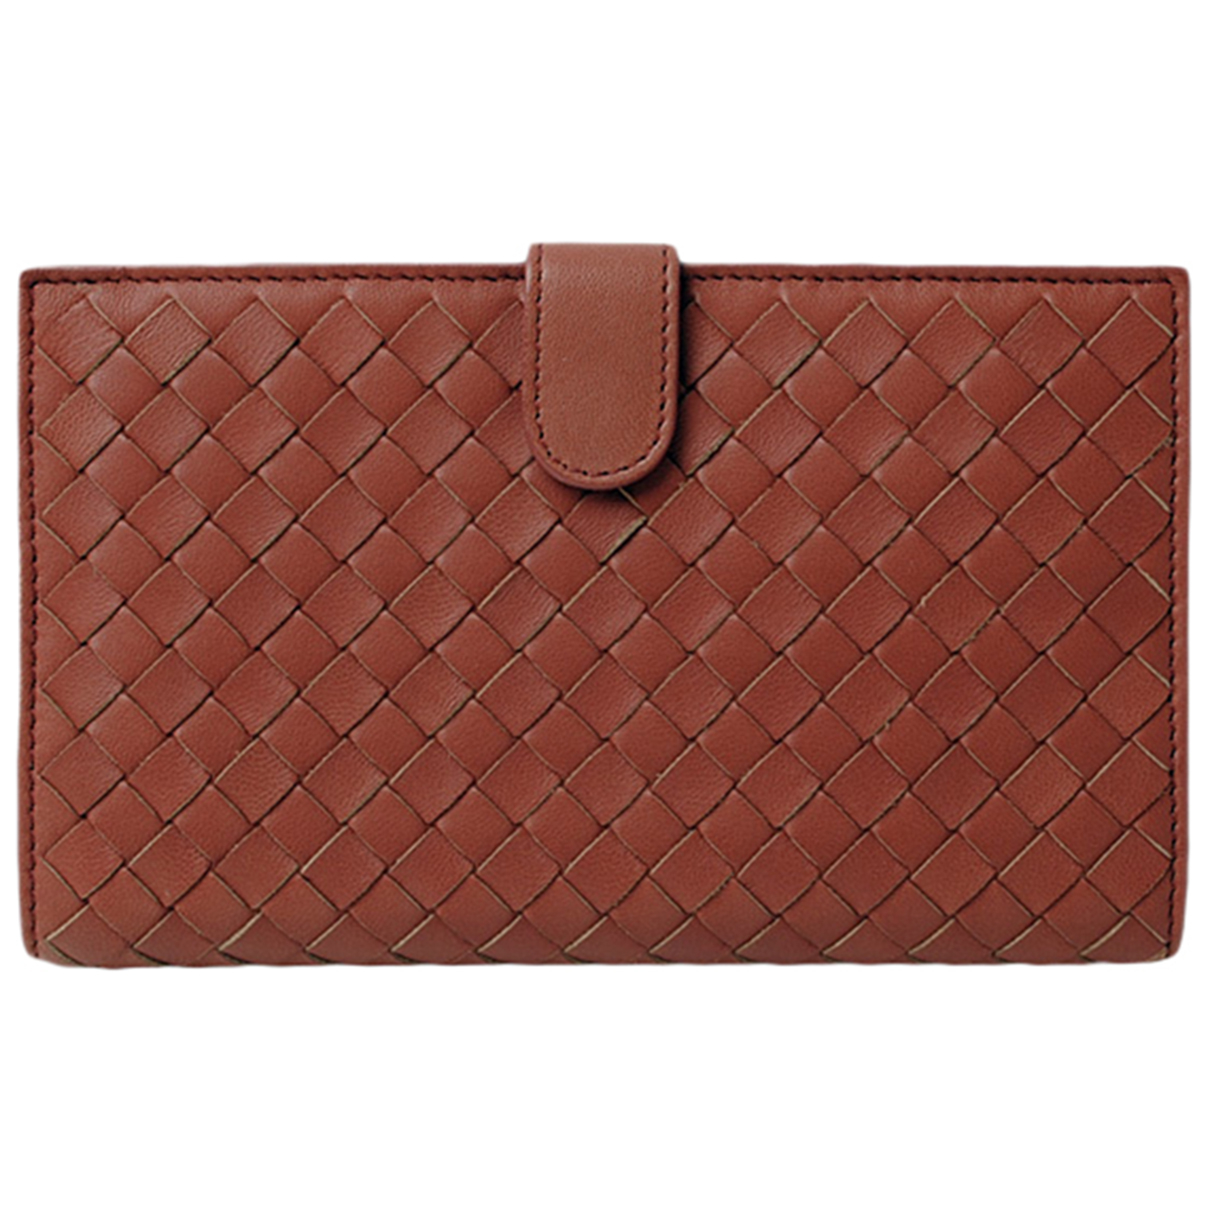 Bottega Veneta Intrecciato Brown Leather wallet for Women \N